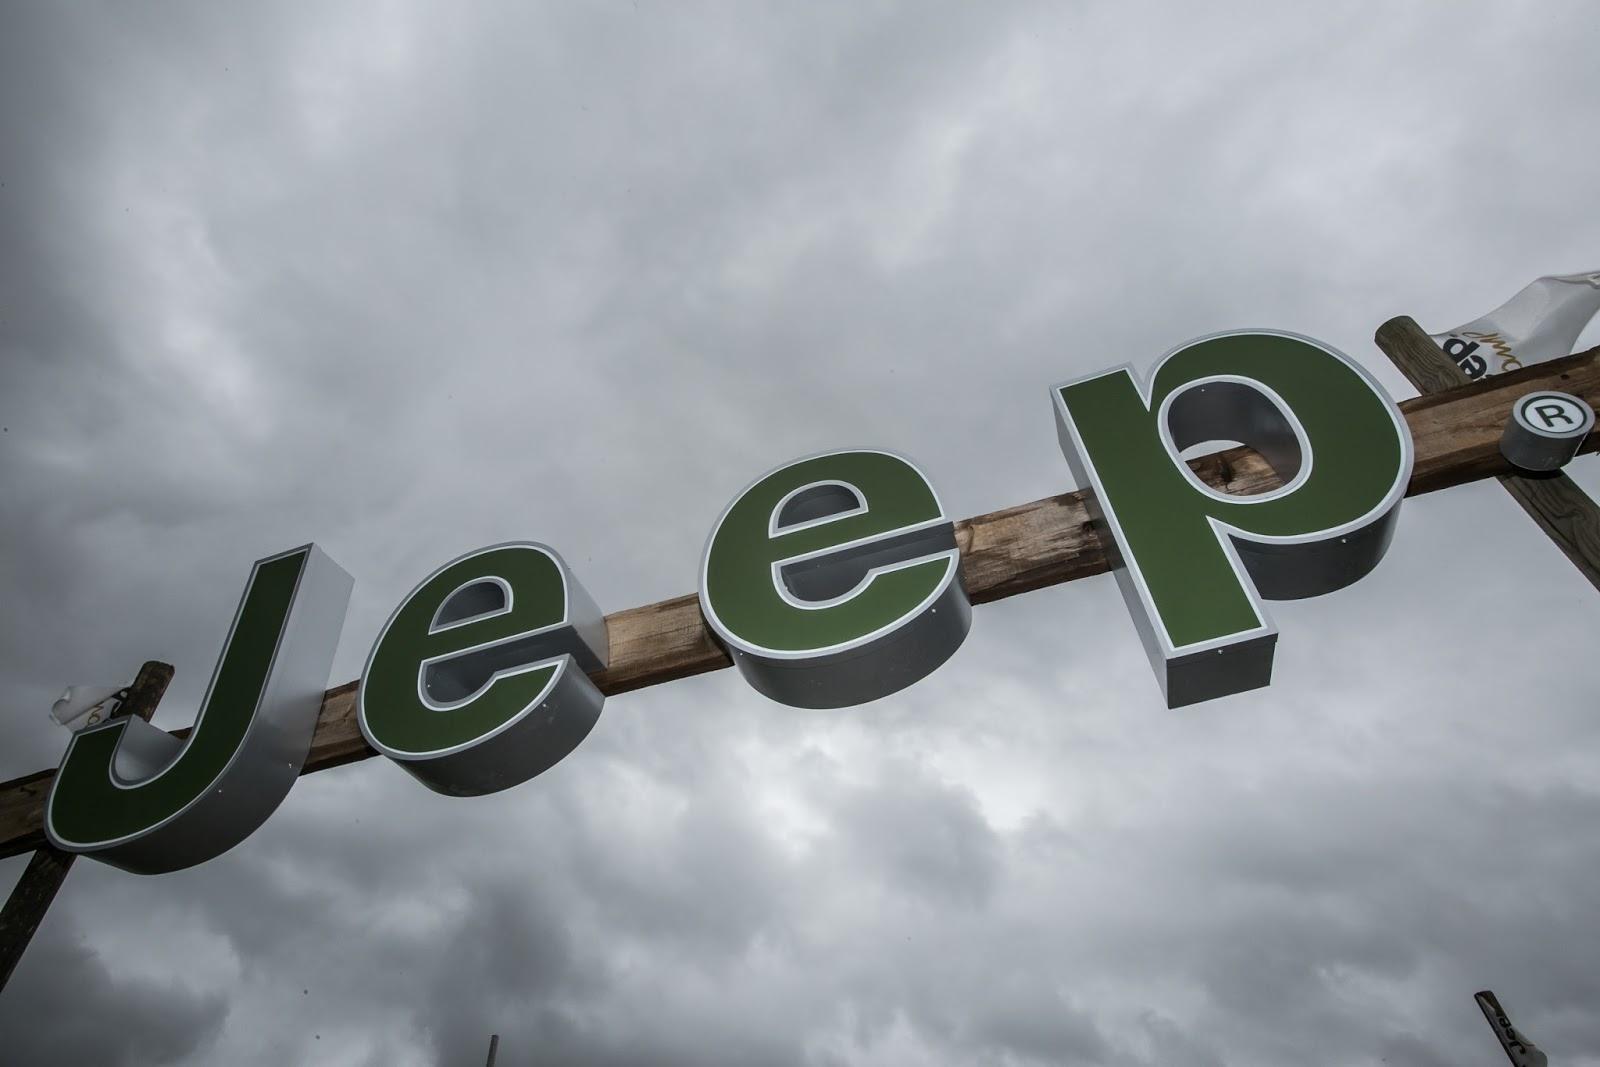 JEEP%2BCAMP GK 0382 Πετάμε ένα Jeep Renegade σε λάσπες, πέτρες, άμμο, λίμνες. Θα τα καταφέρει; Jeep, Jeep Renegade, Renegade, SUV, TEST, zblog, ΔΟΚΙΜΕΣ